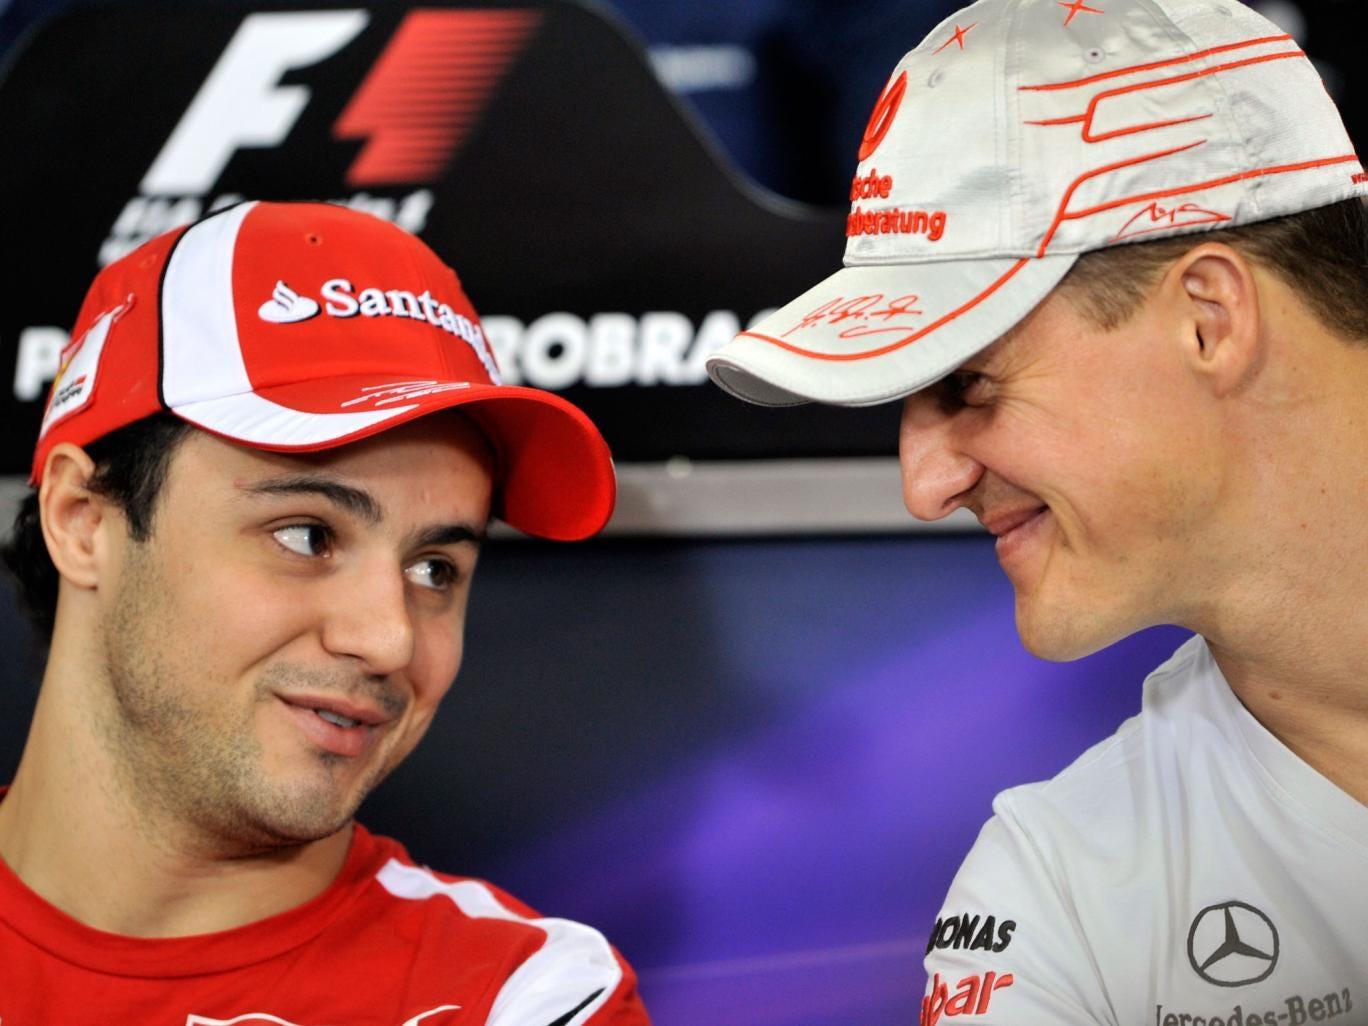 Felipe Massa and Michael Schumacher share a joke at the 2011 Brazilian Grand Prix